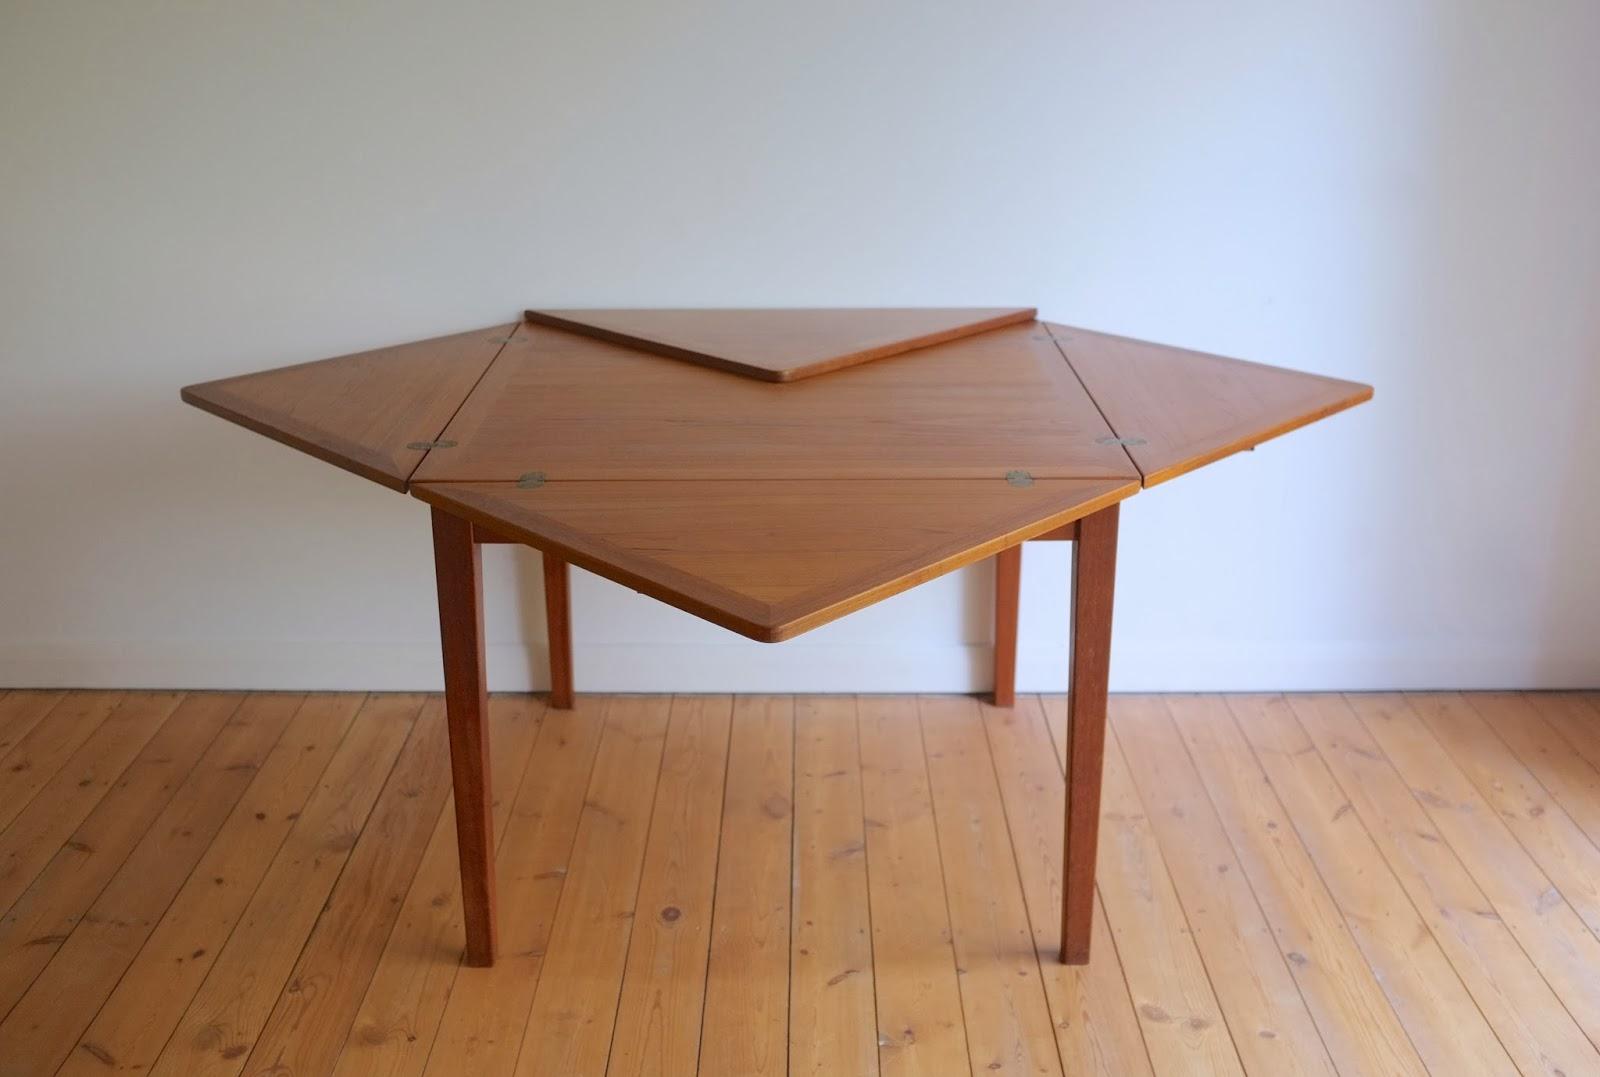 model 38 expanding teak dining table made by slagelse mobelvaerk